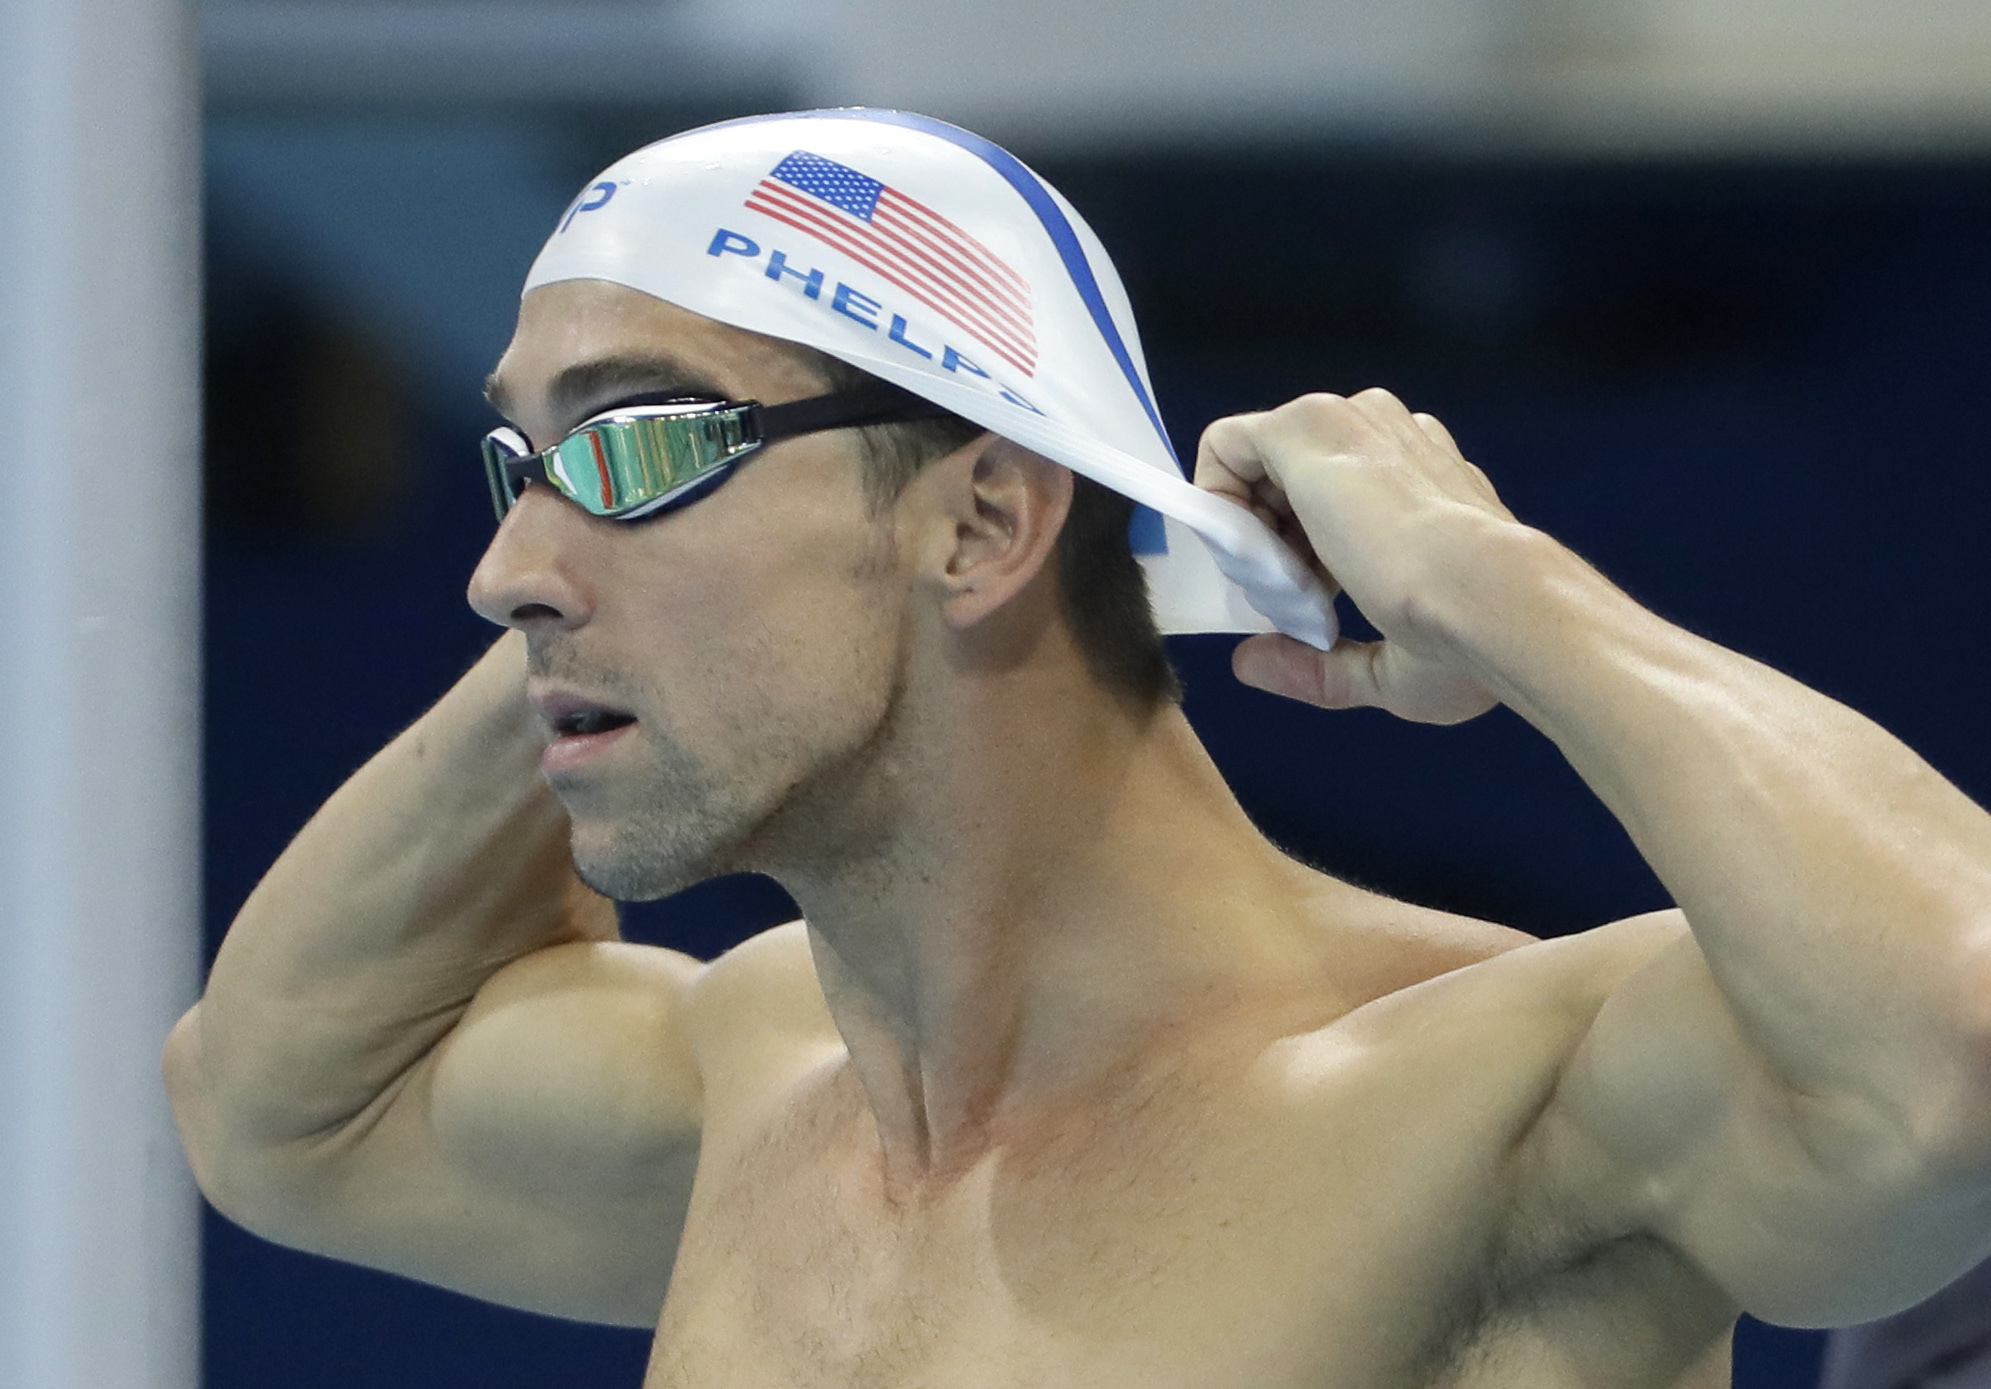 United States' Michael Phelps prepares a swimming training session at the 2016 Summer Olympics in Rio de Janeiro, Brazil, Tuesday, Aug. 2, 2016. (AP Photo/Matt Slocum)